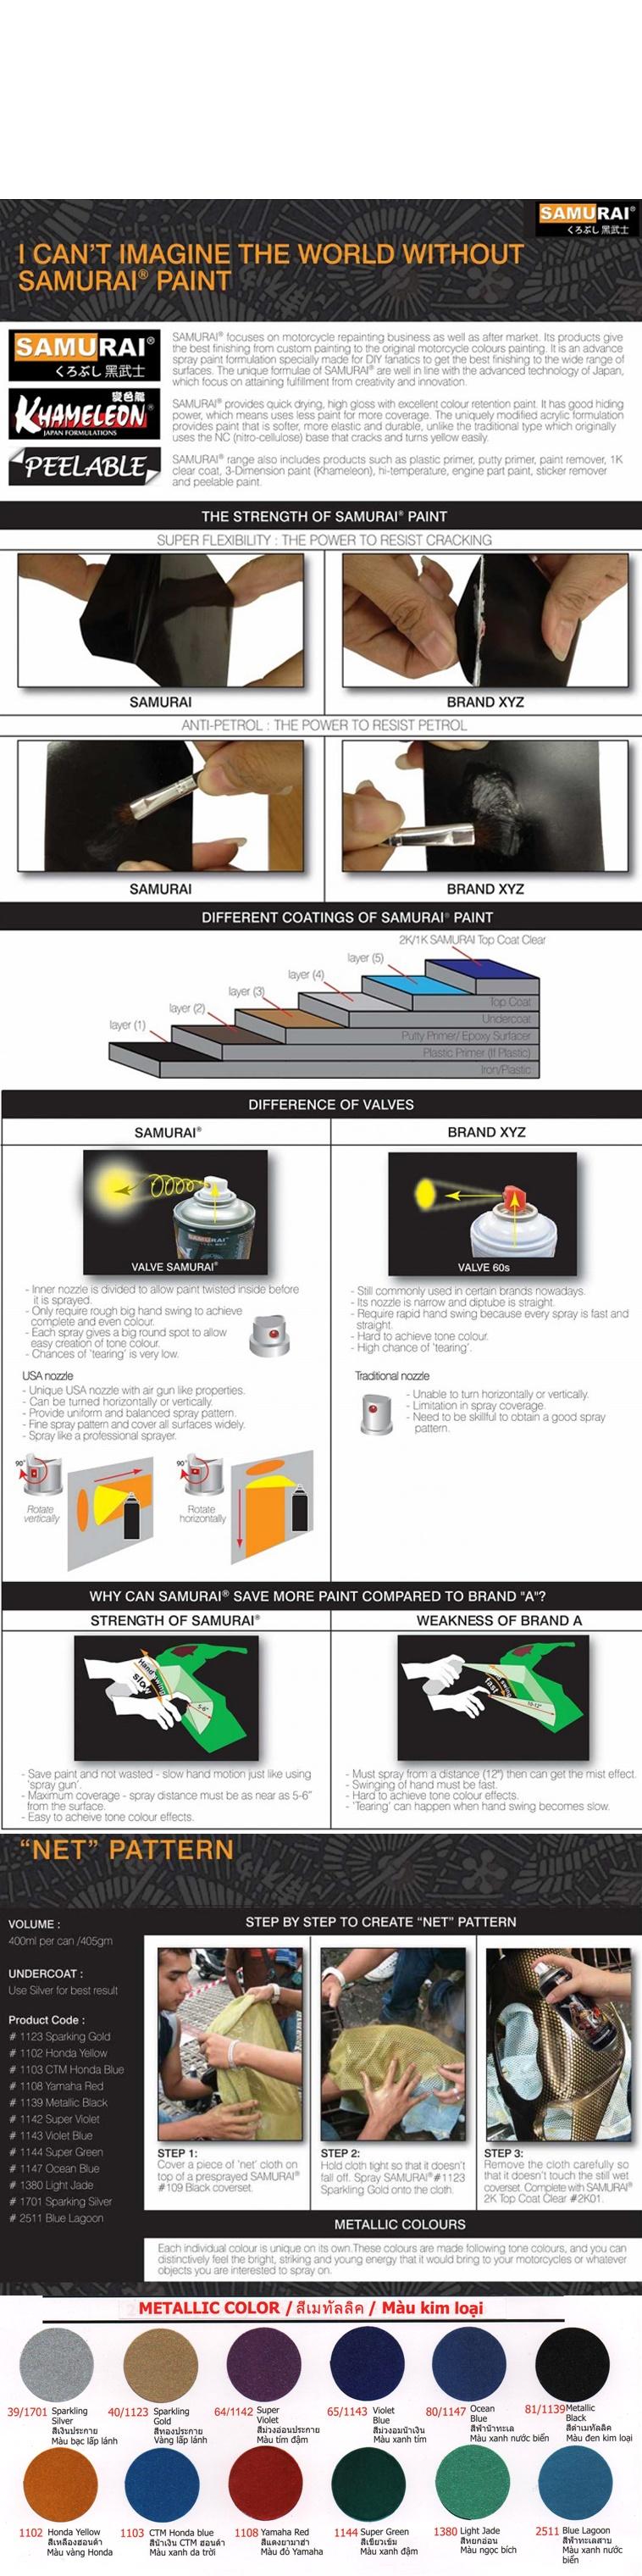 Specifications Of Samurai 811139* Metallic Spray Paint Metallic 400Ml (Black)